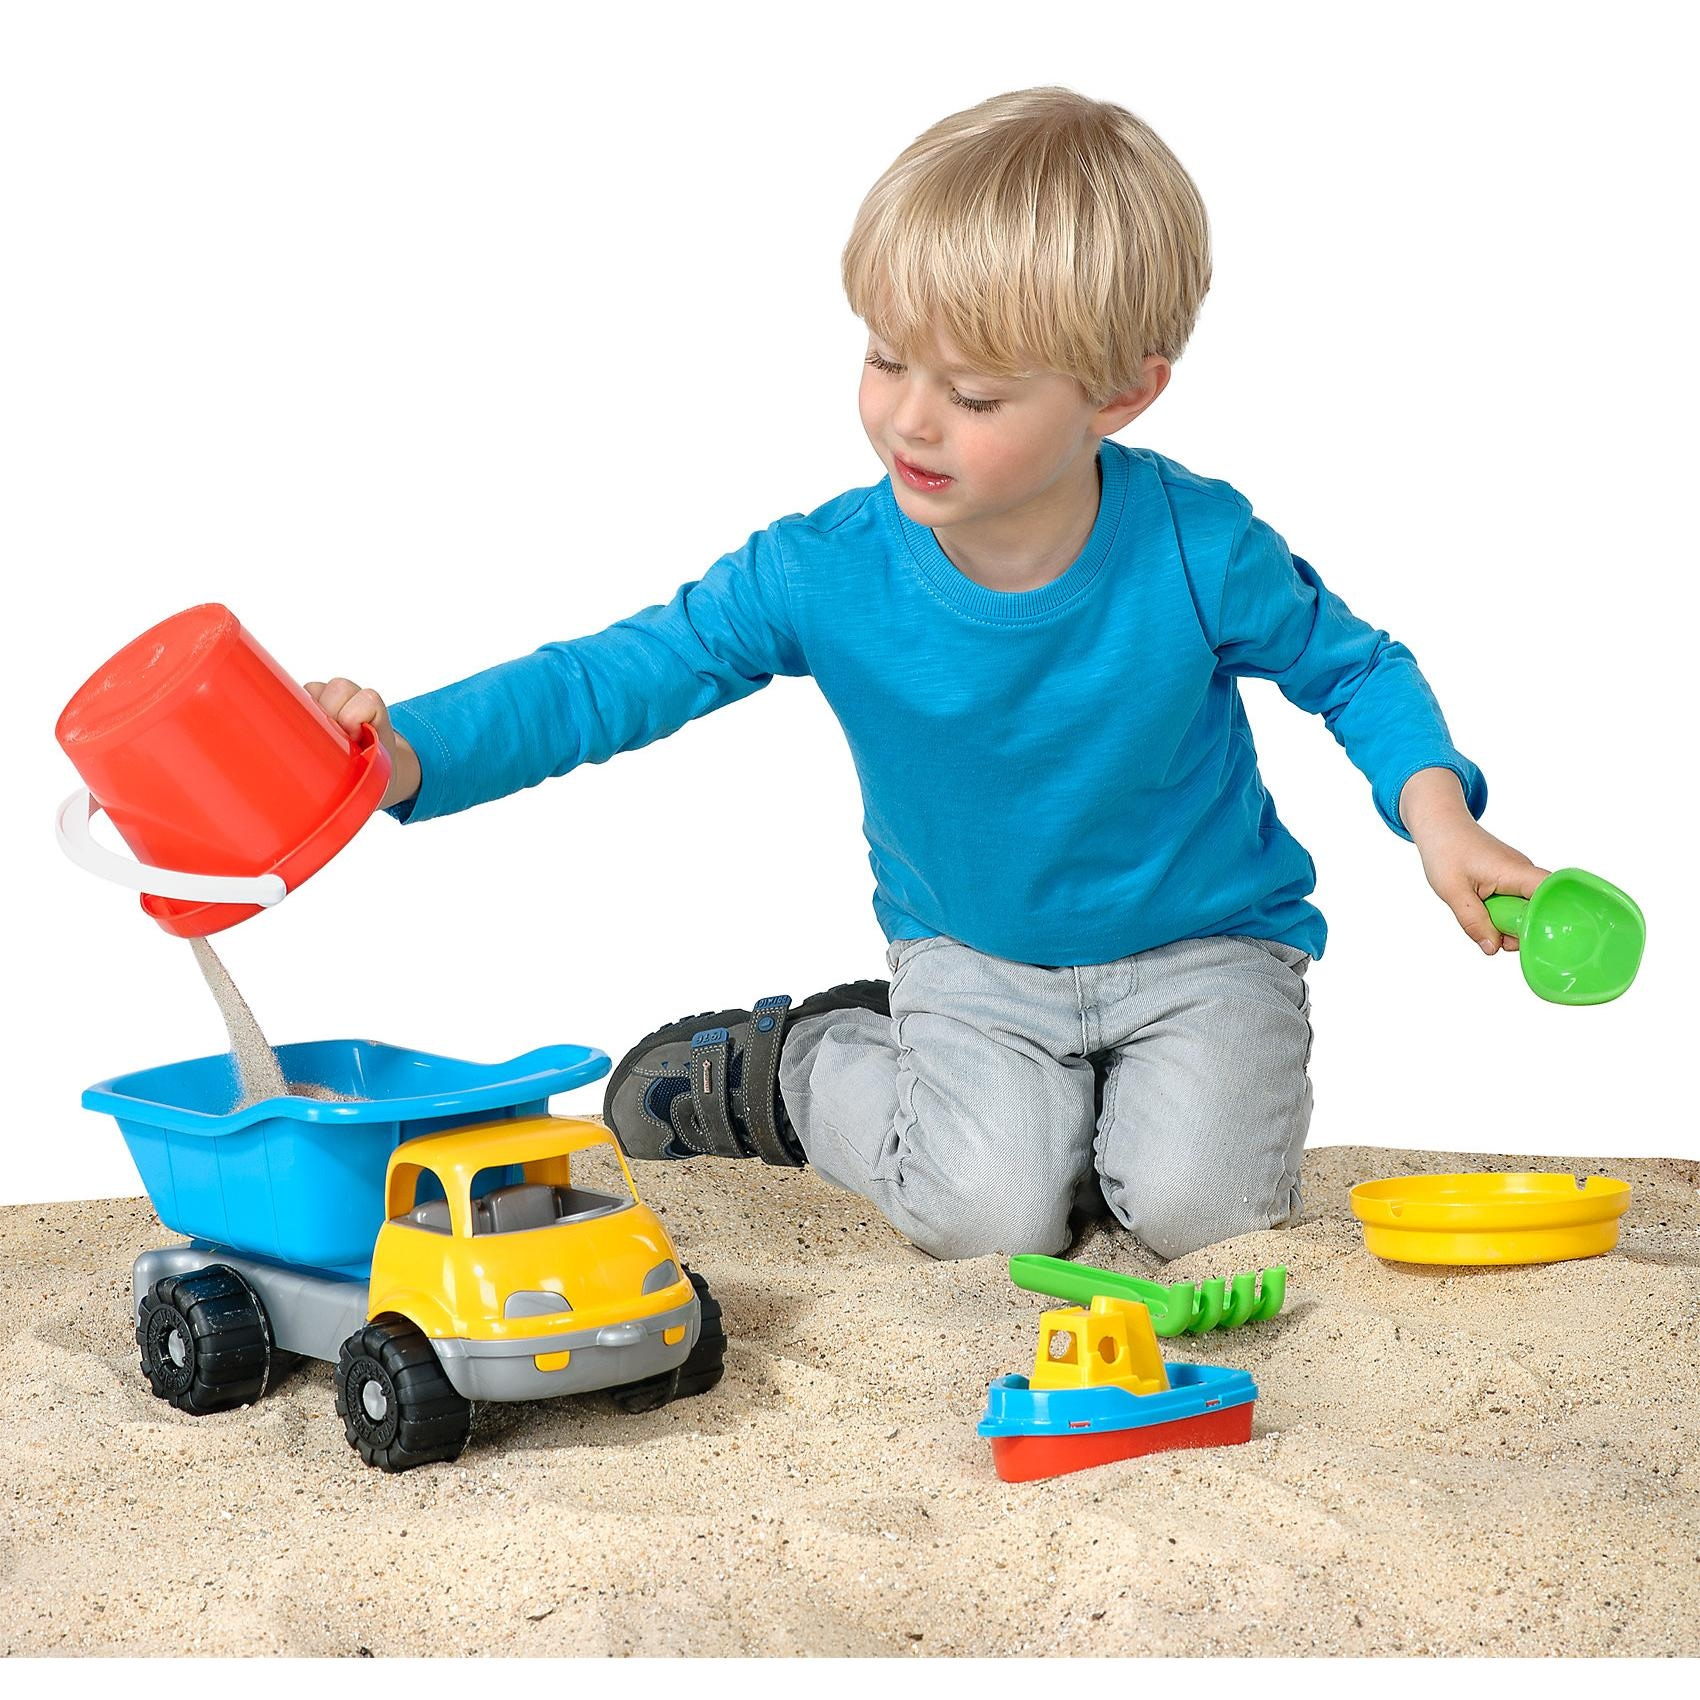 MyToys Sandkipper mit Zubehör 6-teilig